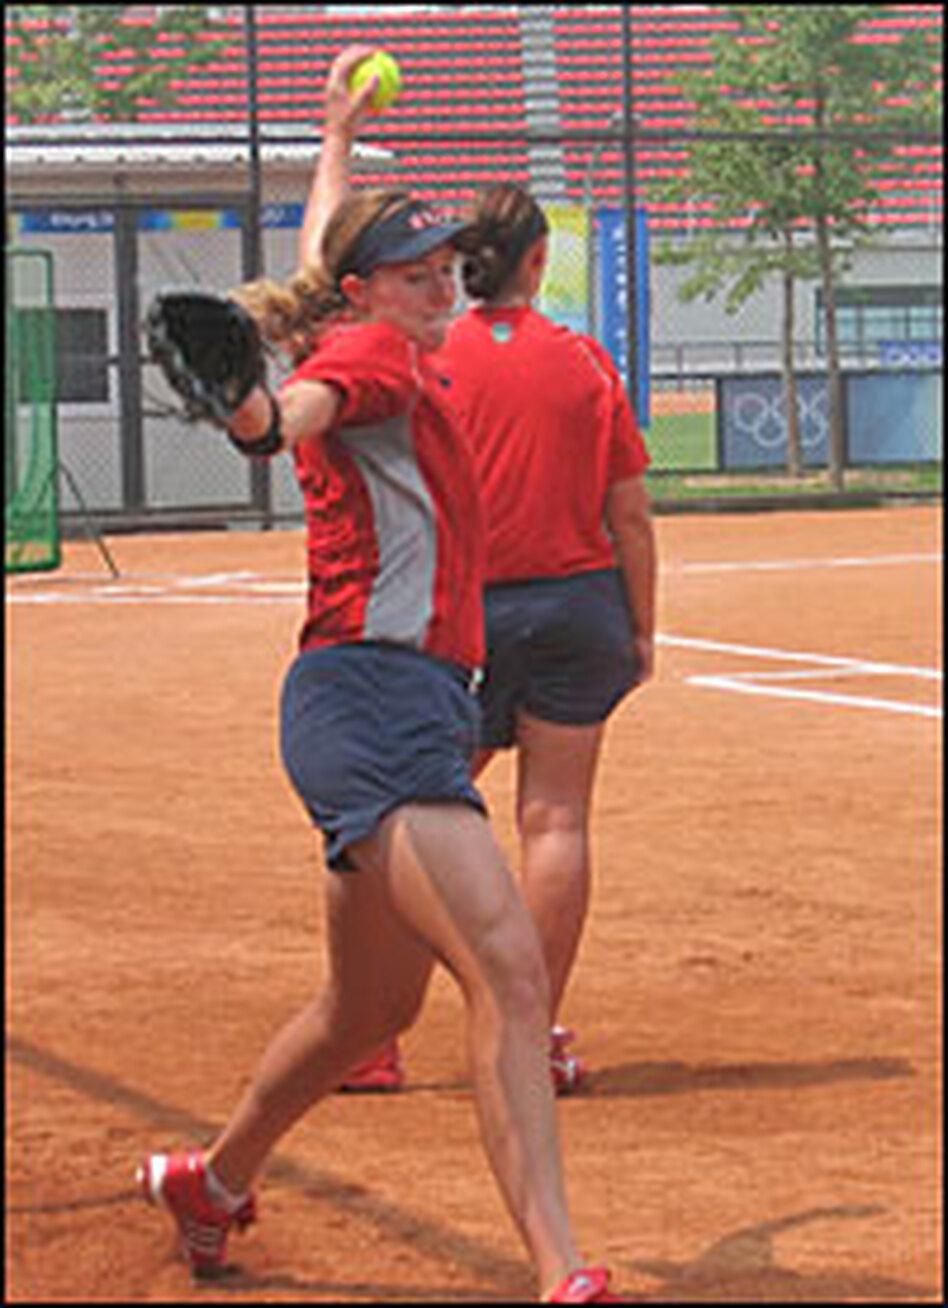 U.S. pitcher Monica Abbott throws a softball during practice.  Speeds can reach between 65 and 70 mph.